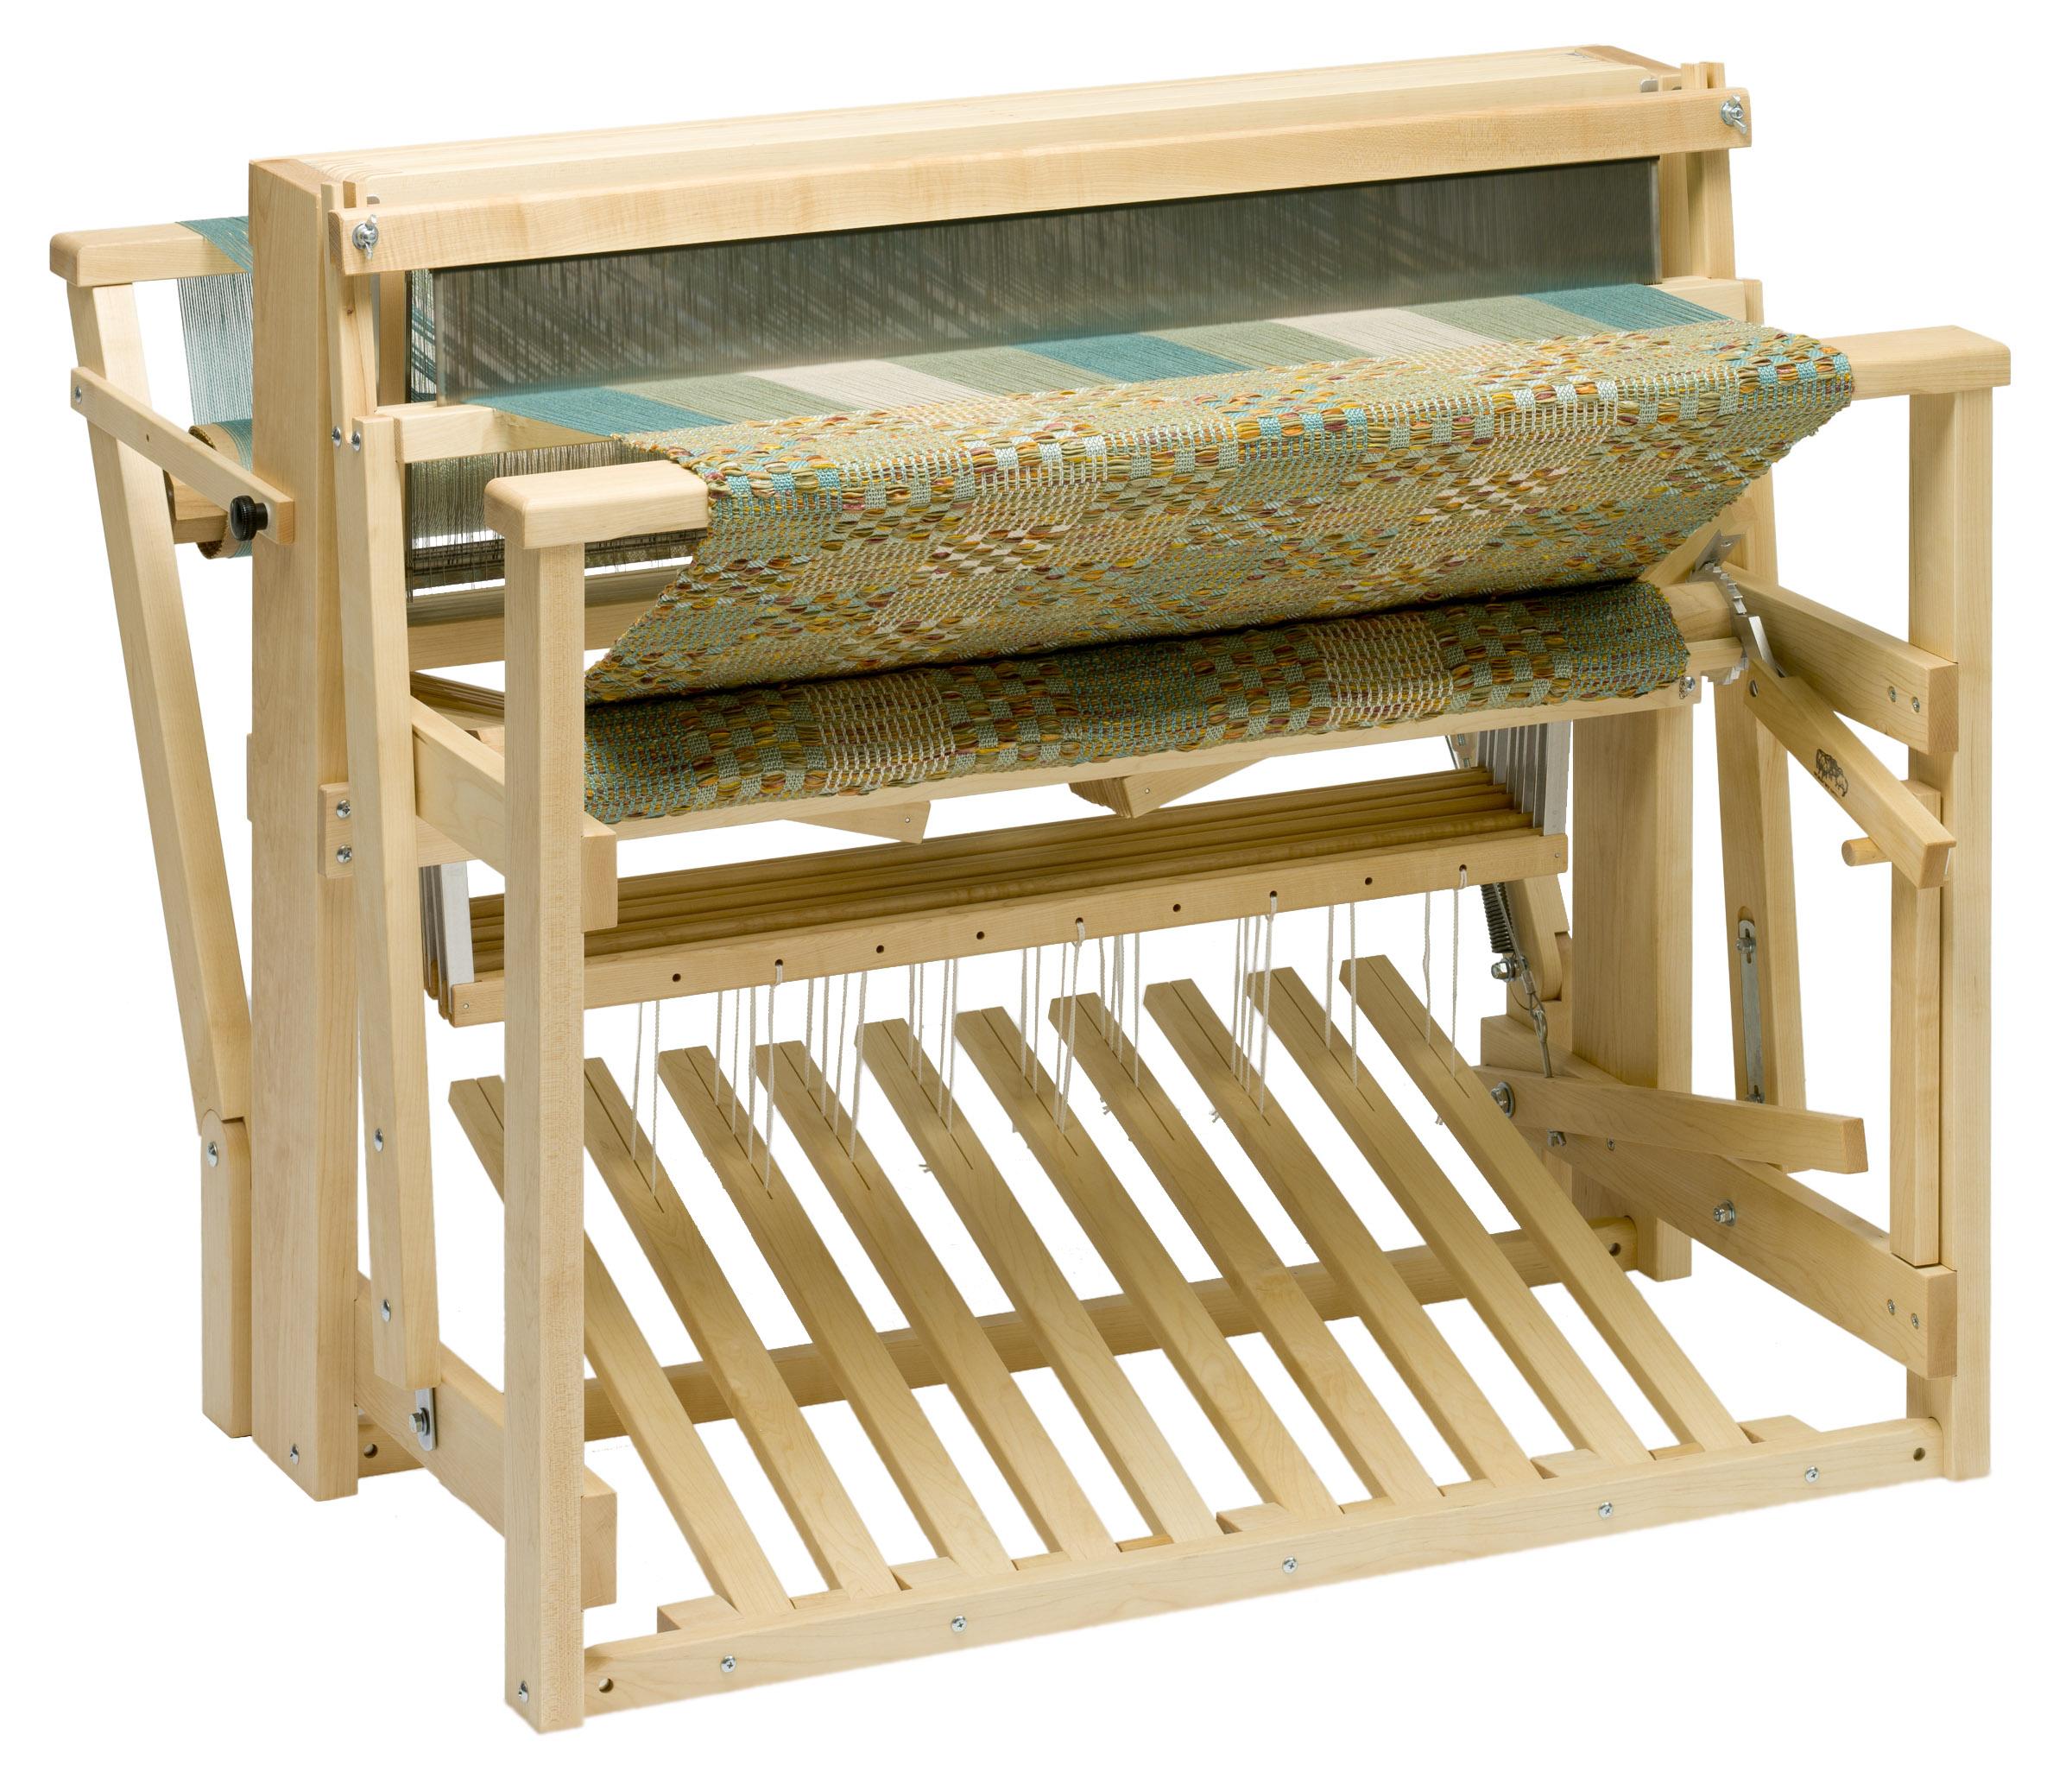 Floor Looms - Mielke's Fiber Arts